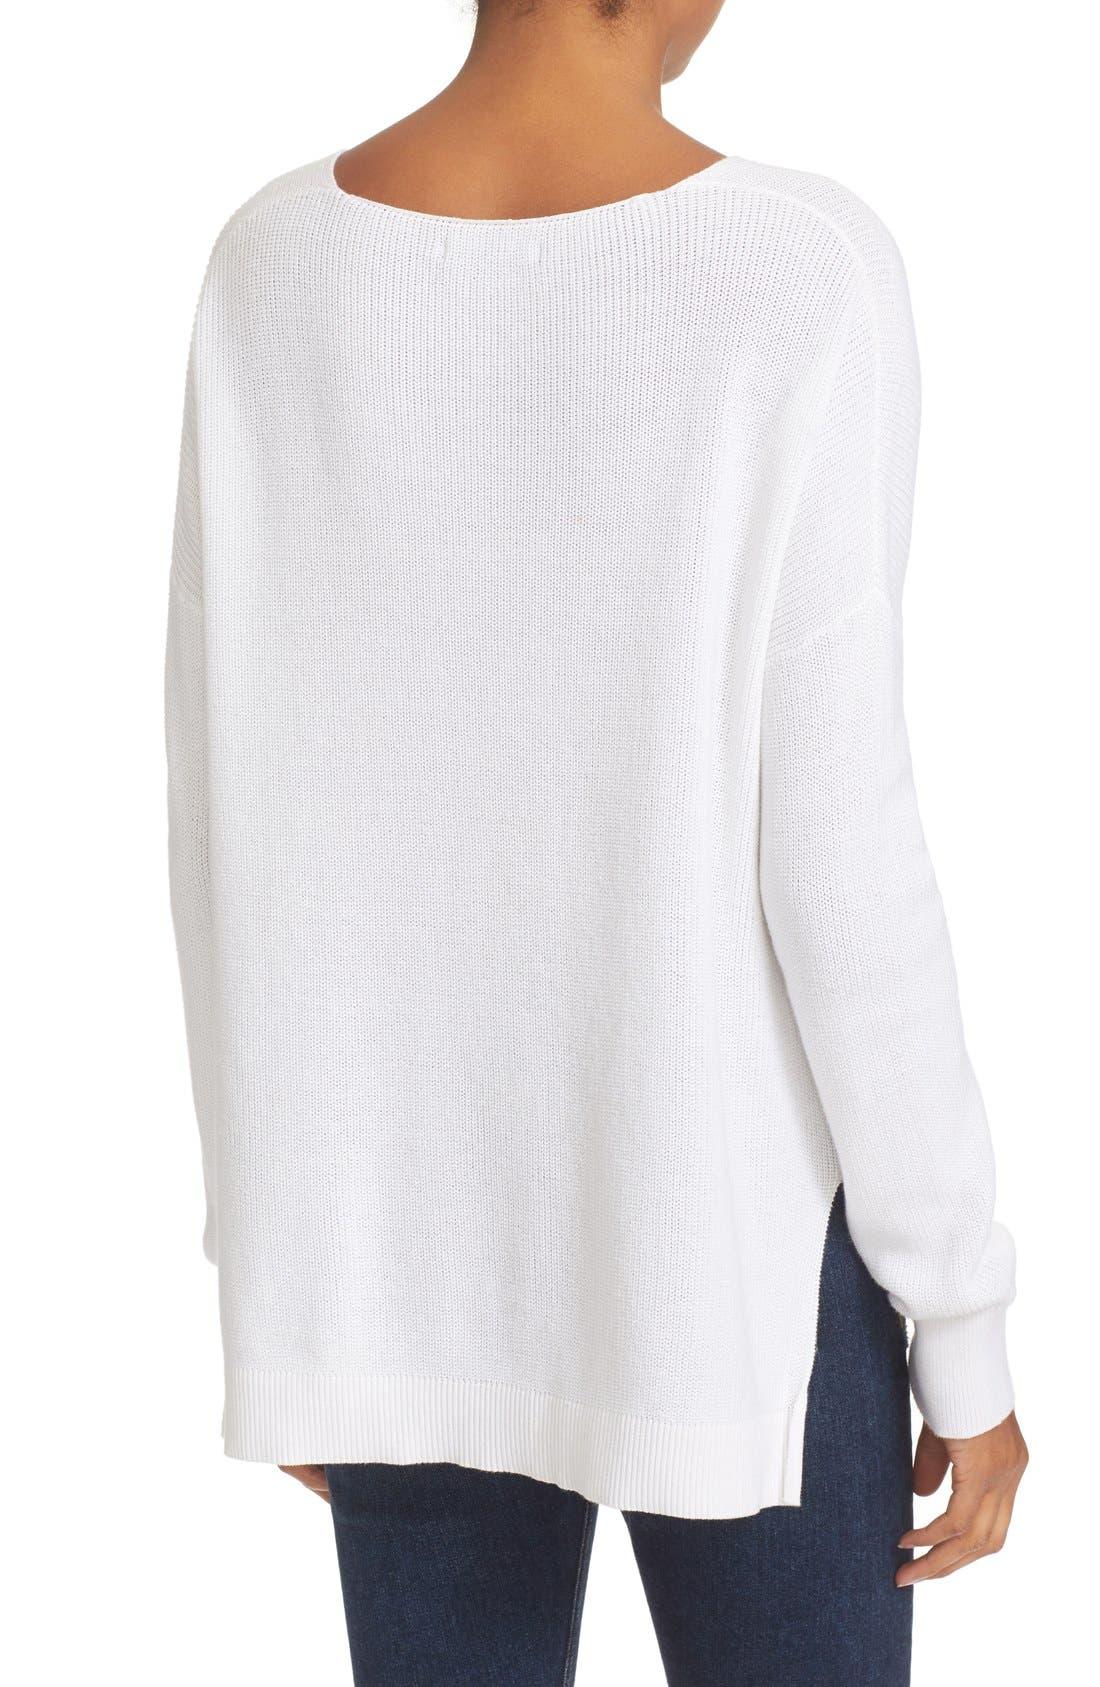 Alternate Image 2  - rag & bone/JEAN Taylor Washed Cotton Sweater